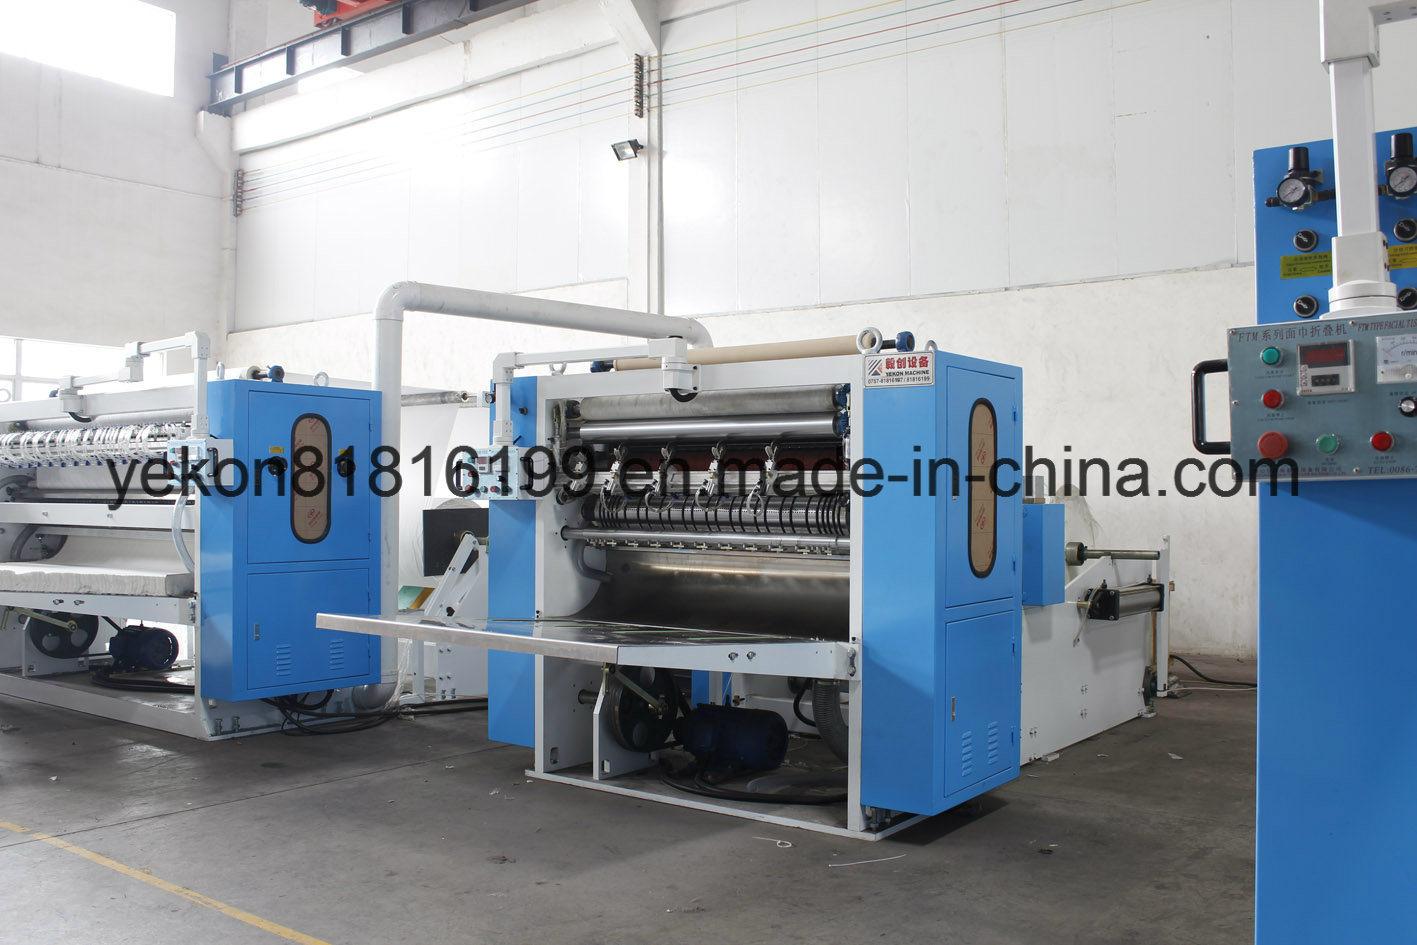 High Speed L Tissue Paper Folding Machine